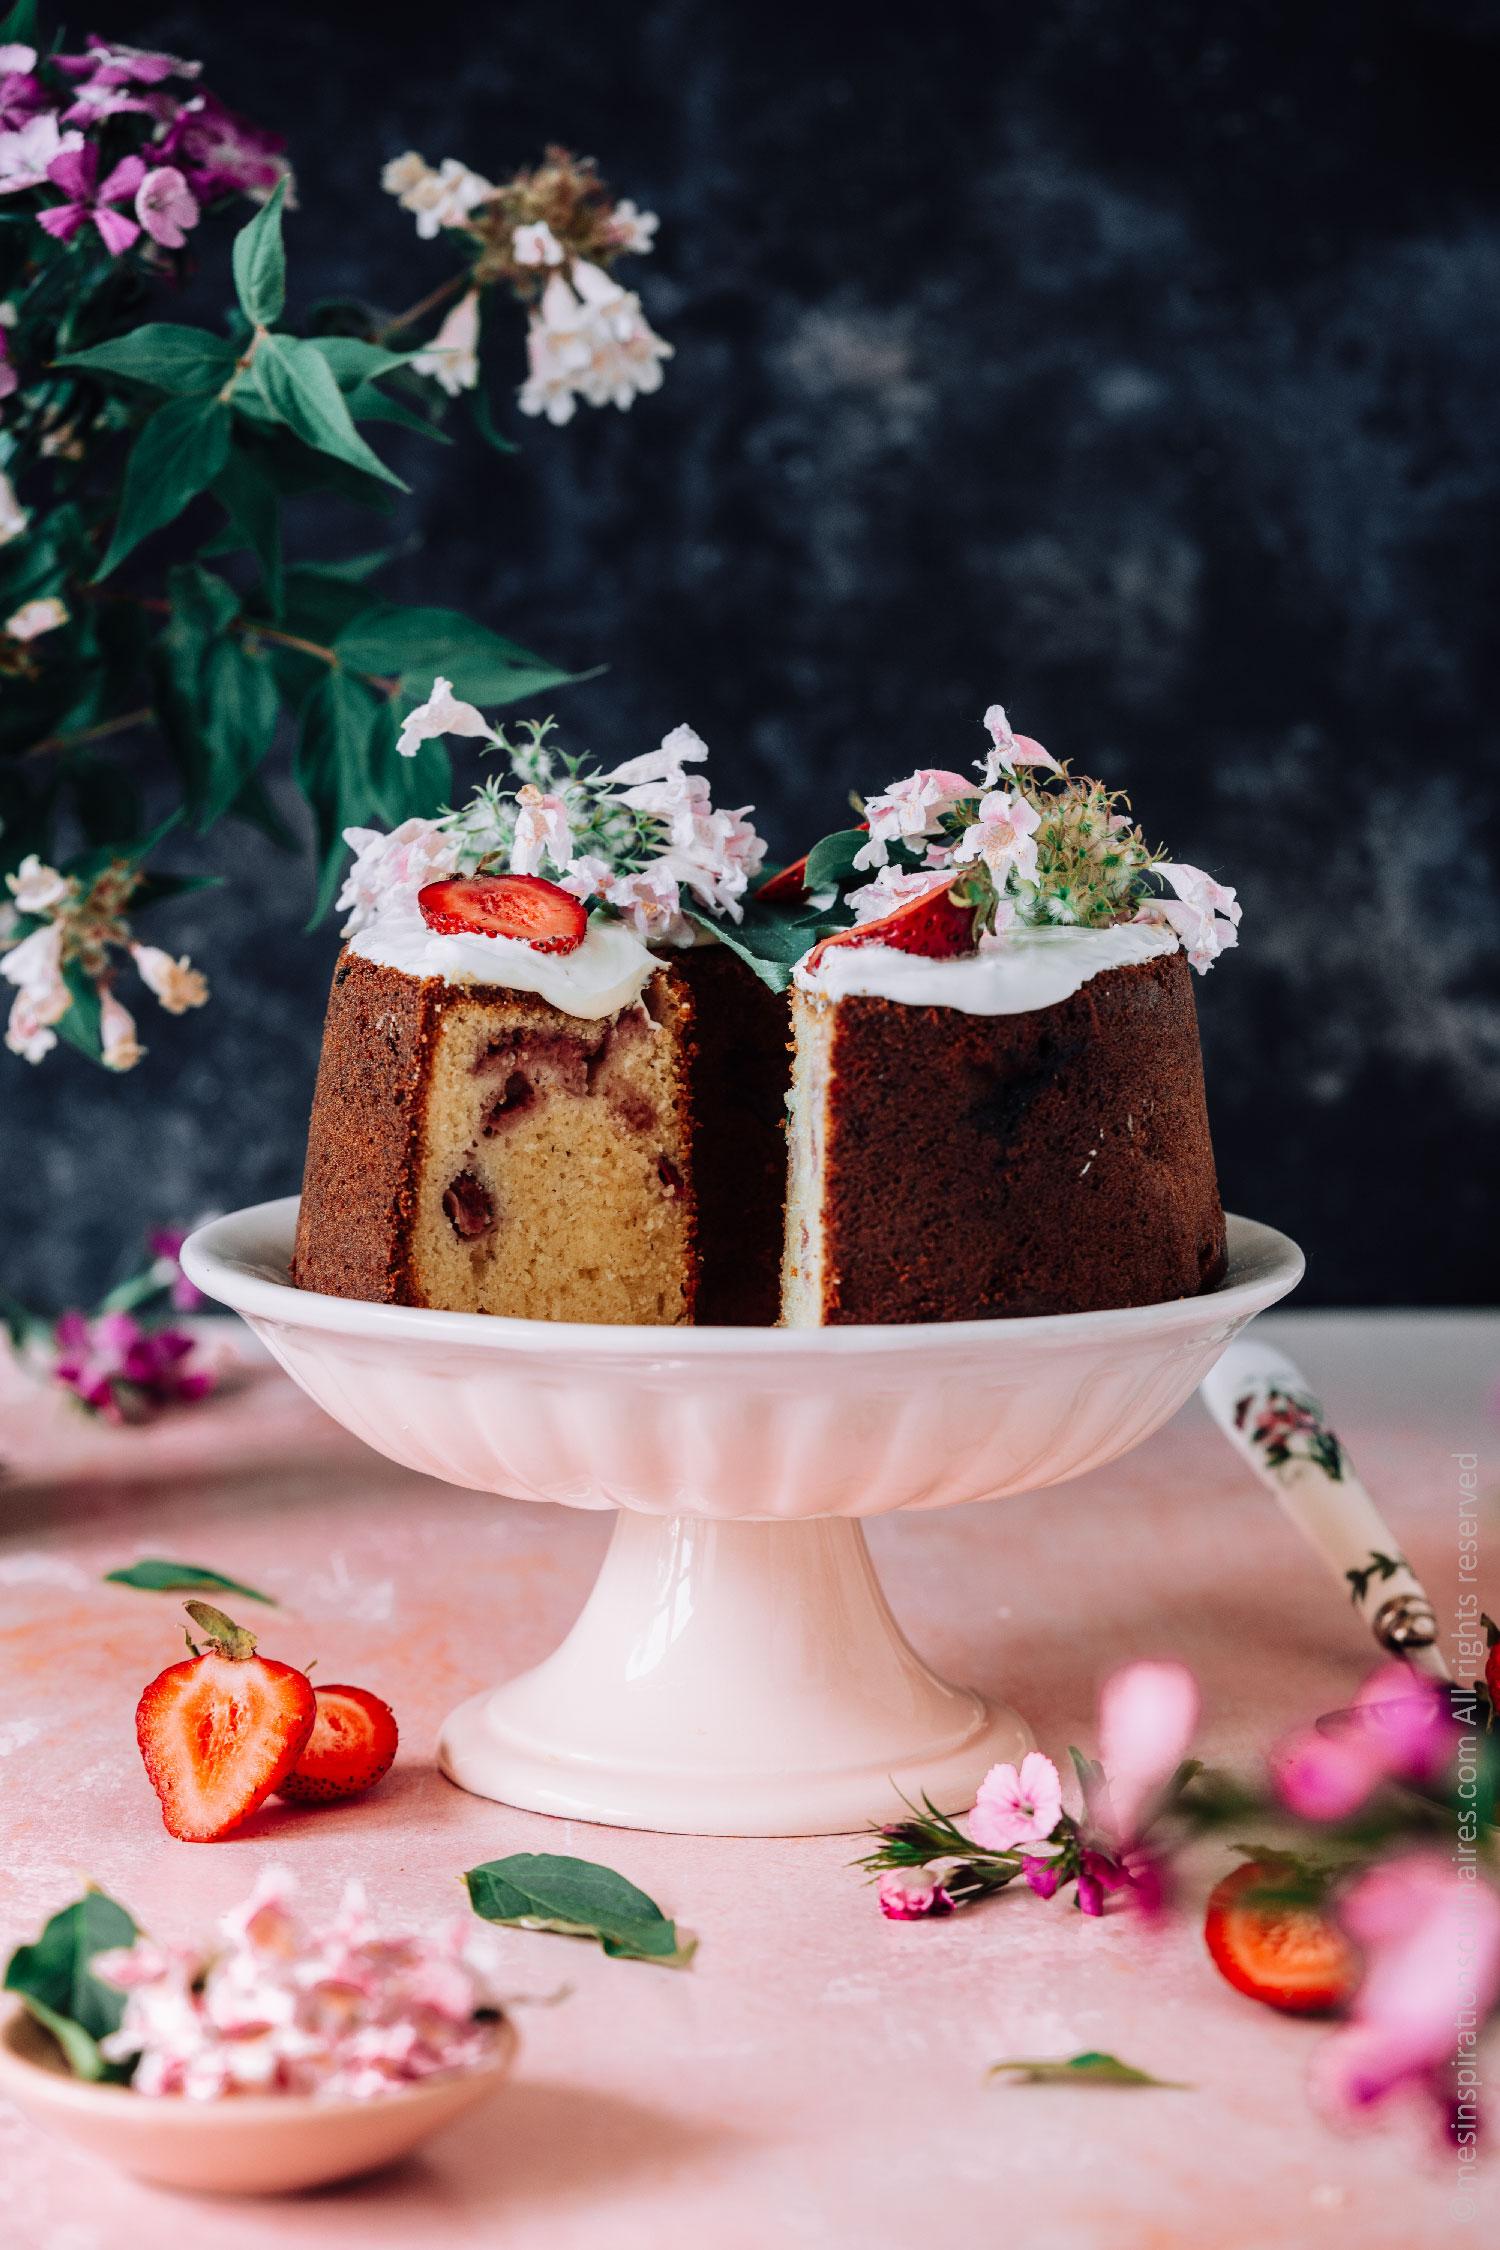 Cake chocolat blanc et fraises